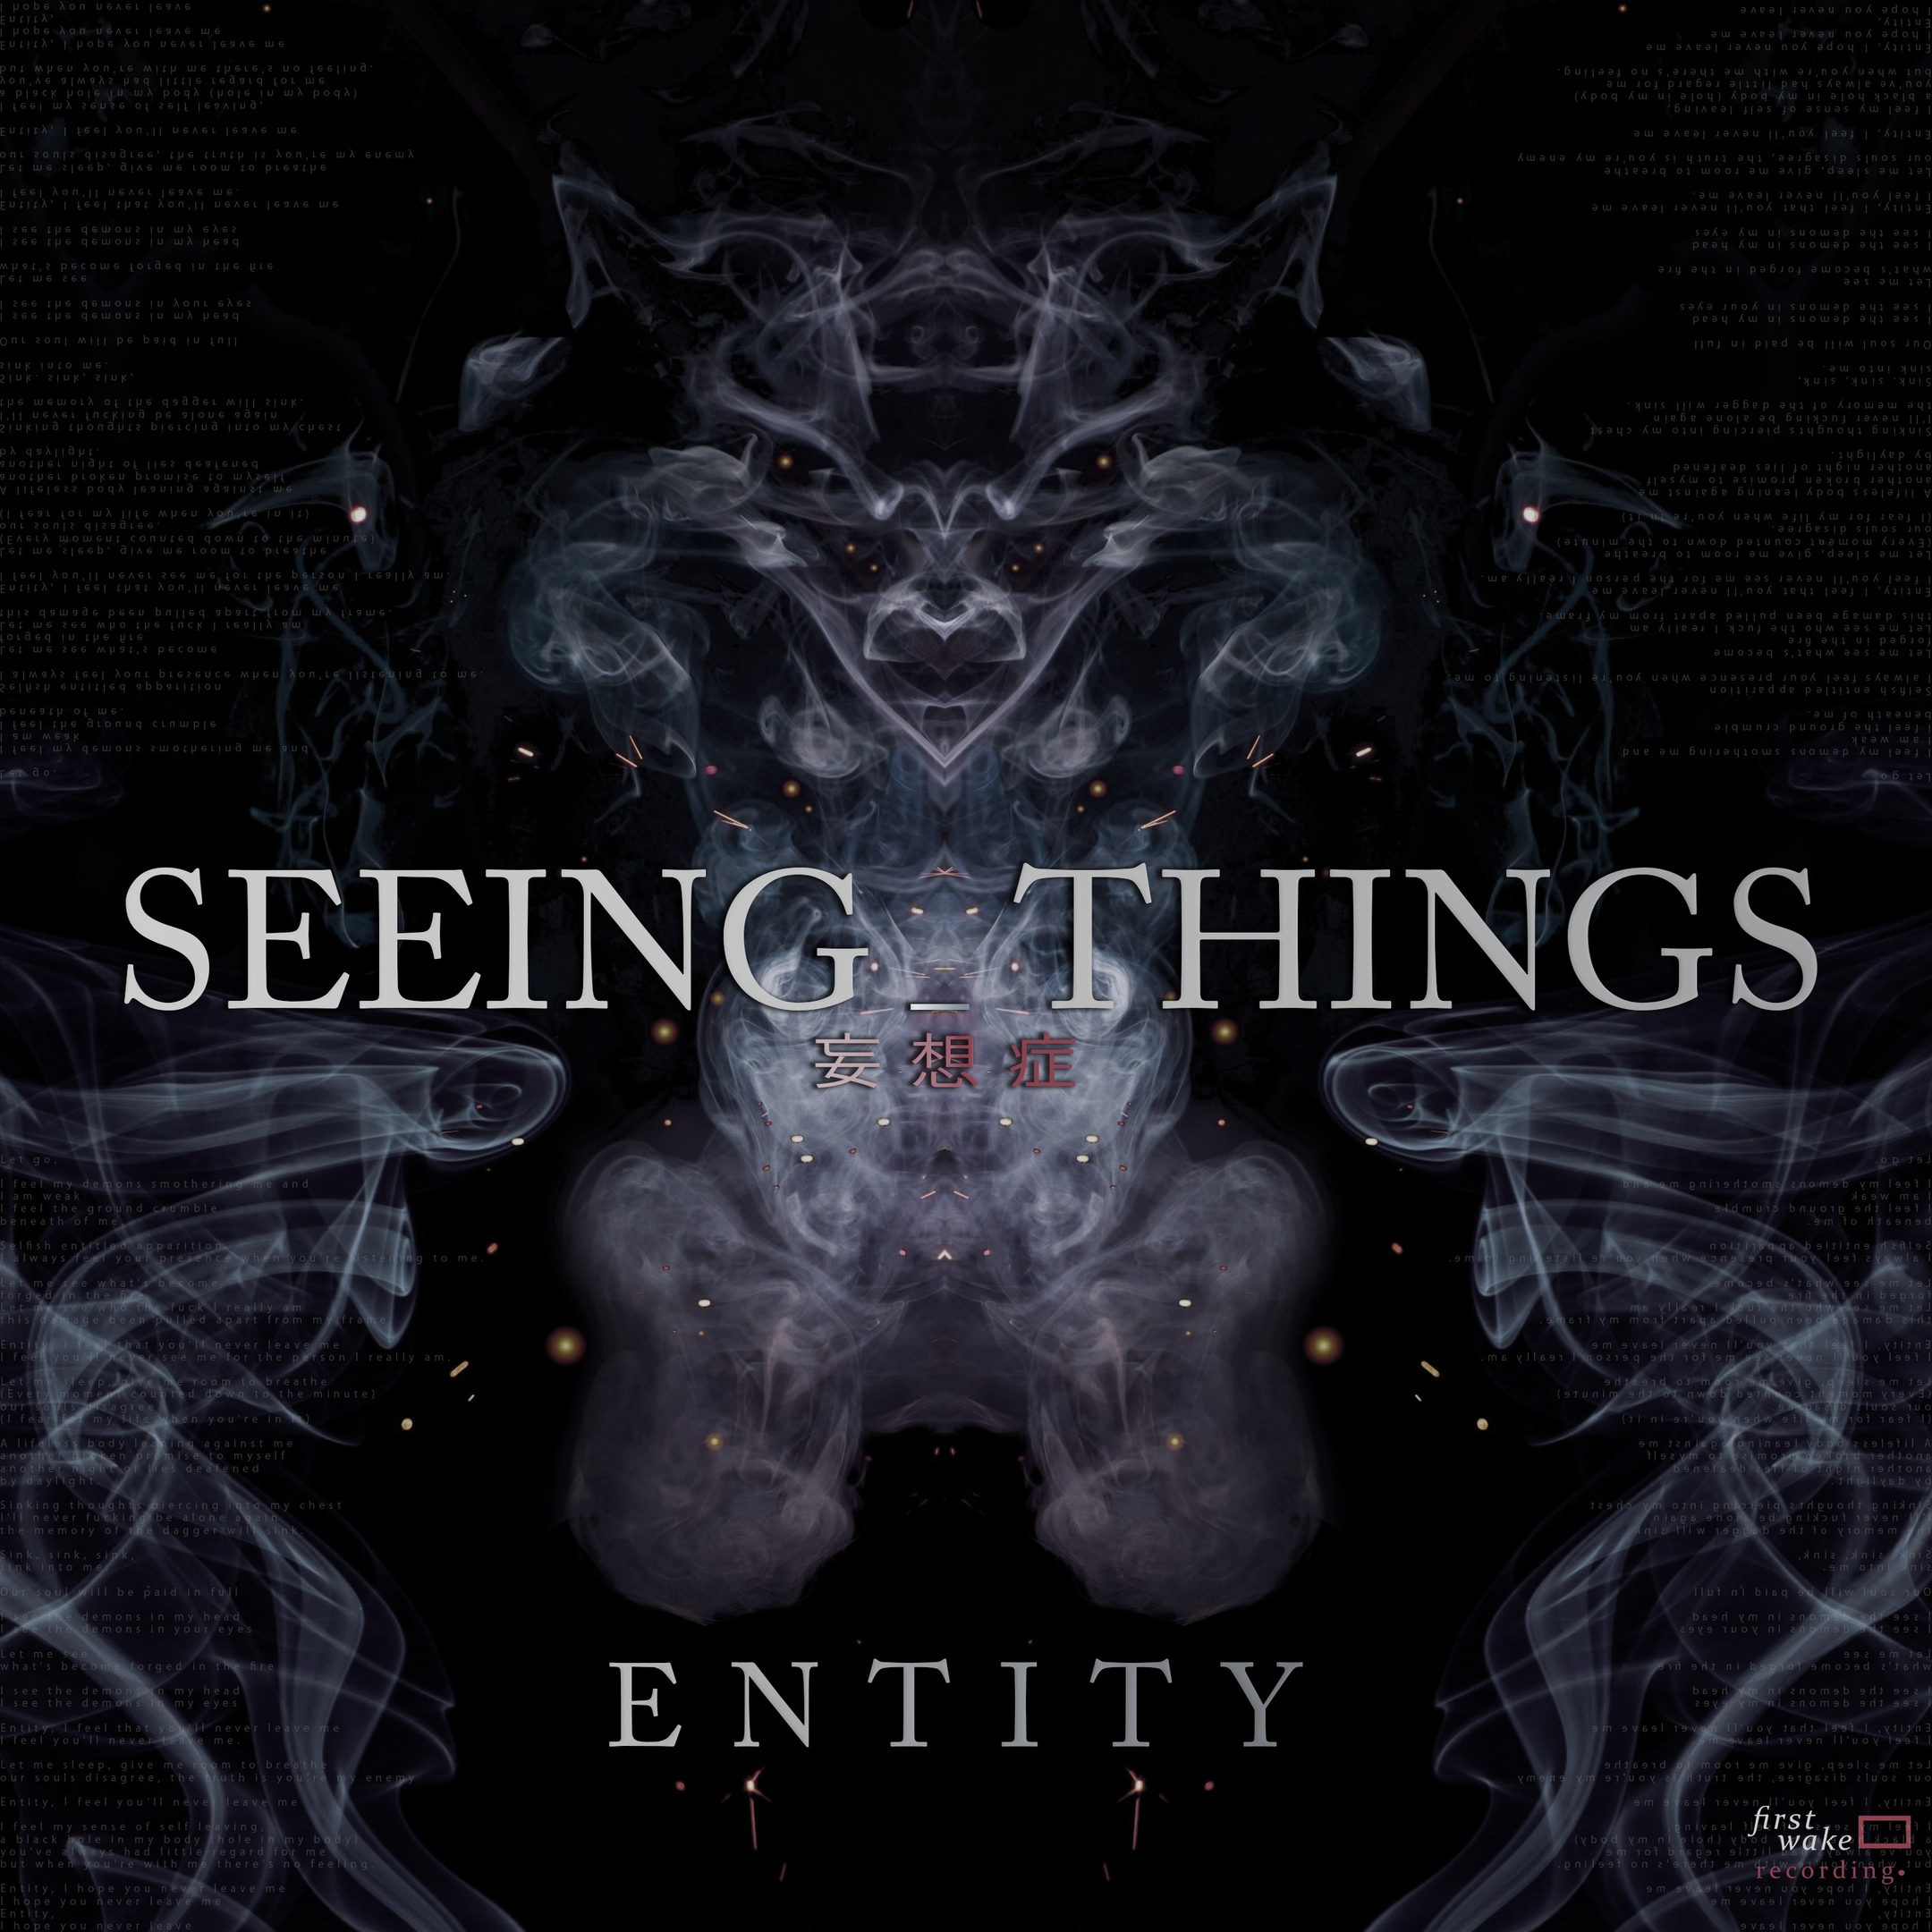 Seeing Things - Entity [single] (2019)